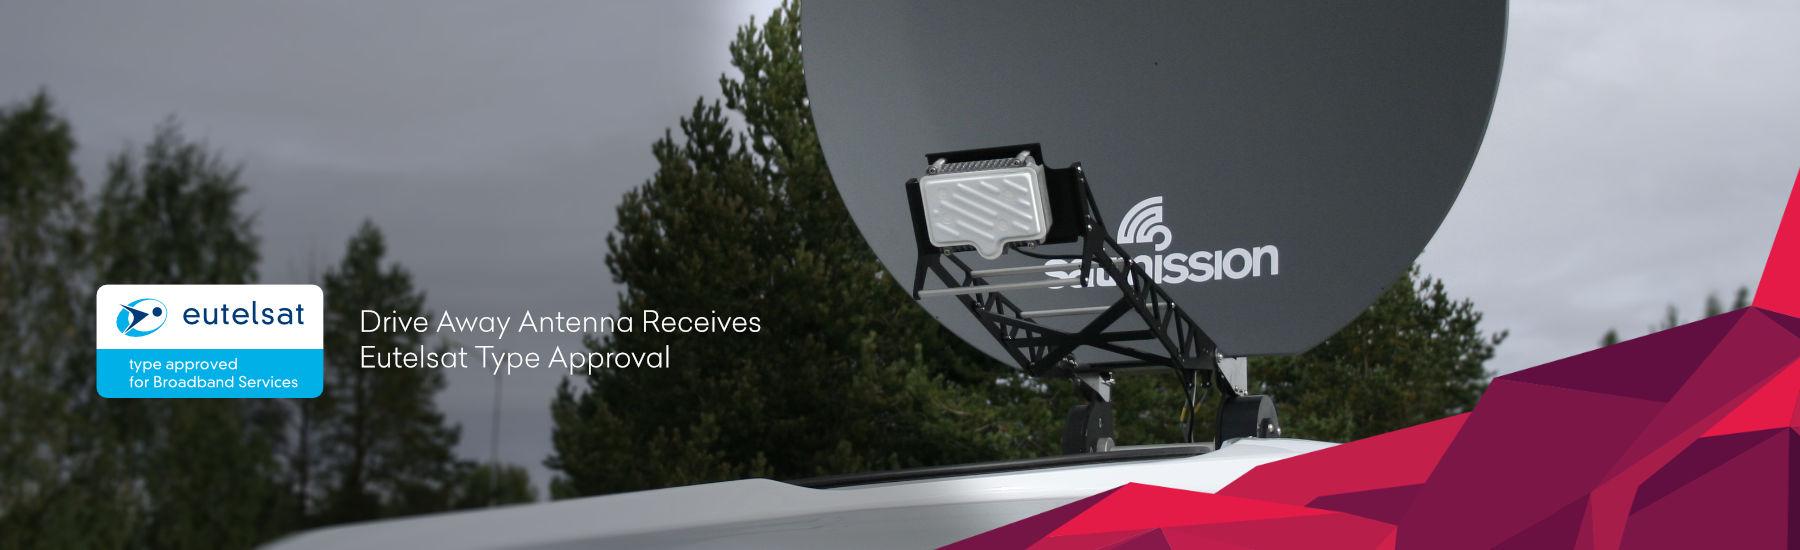 Header05-Eutelsat